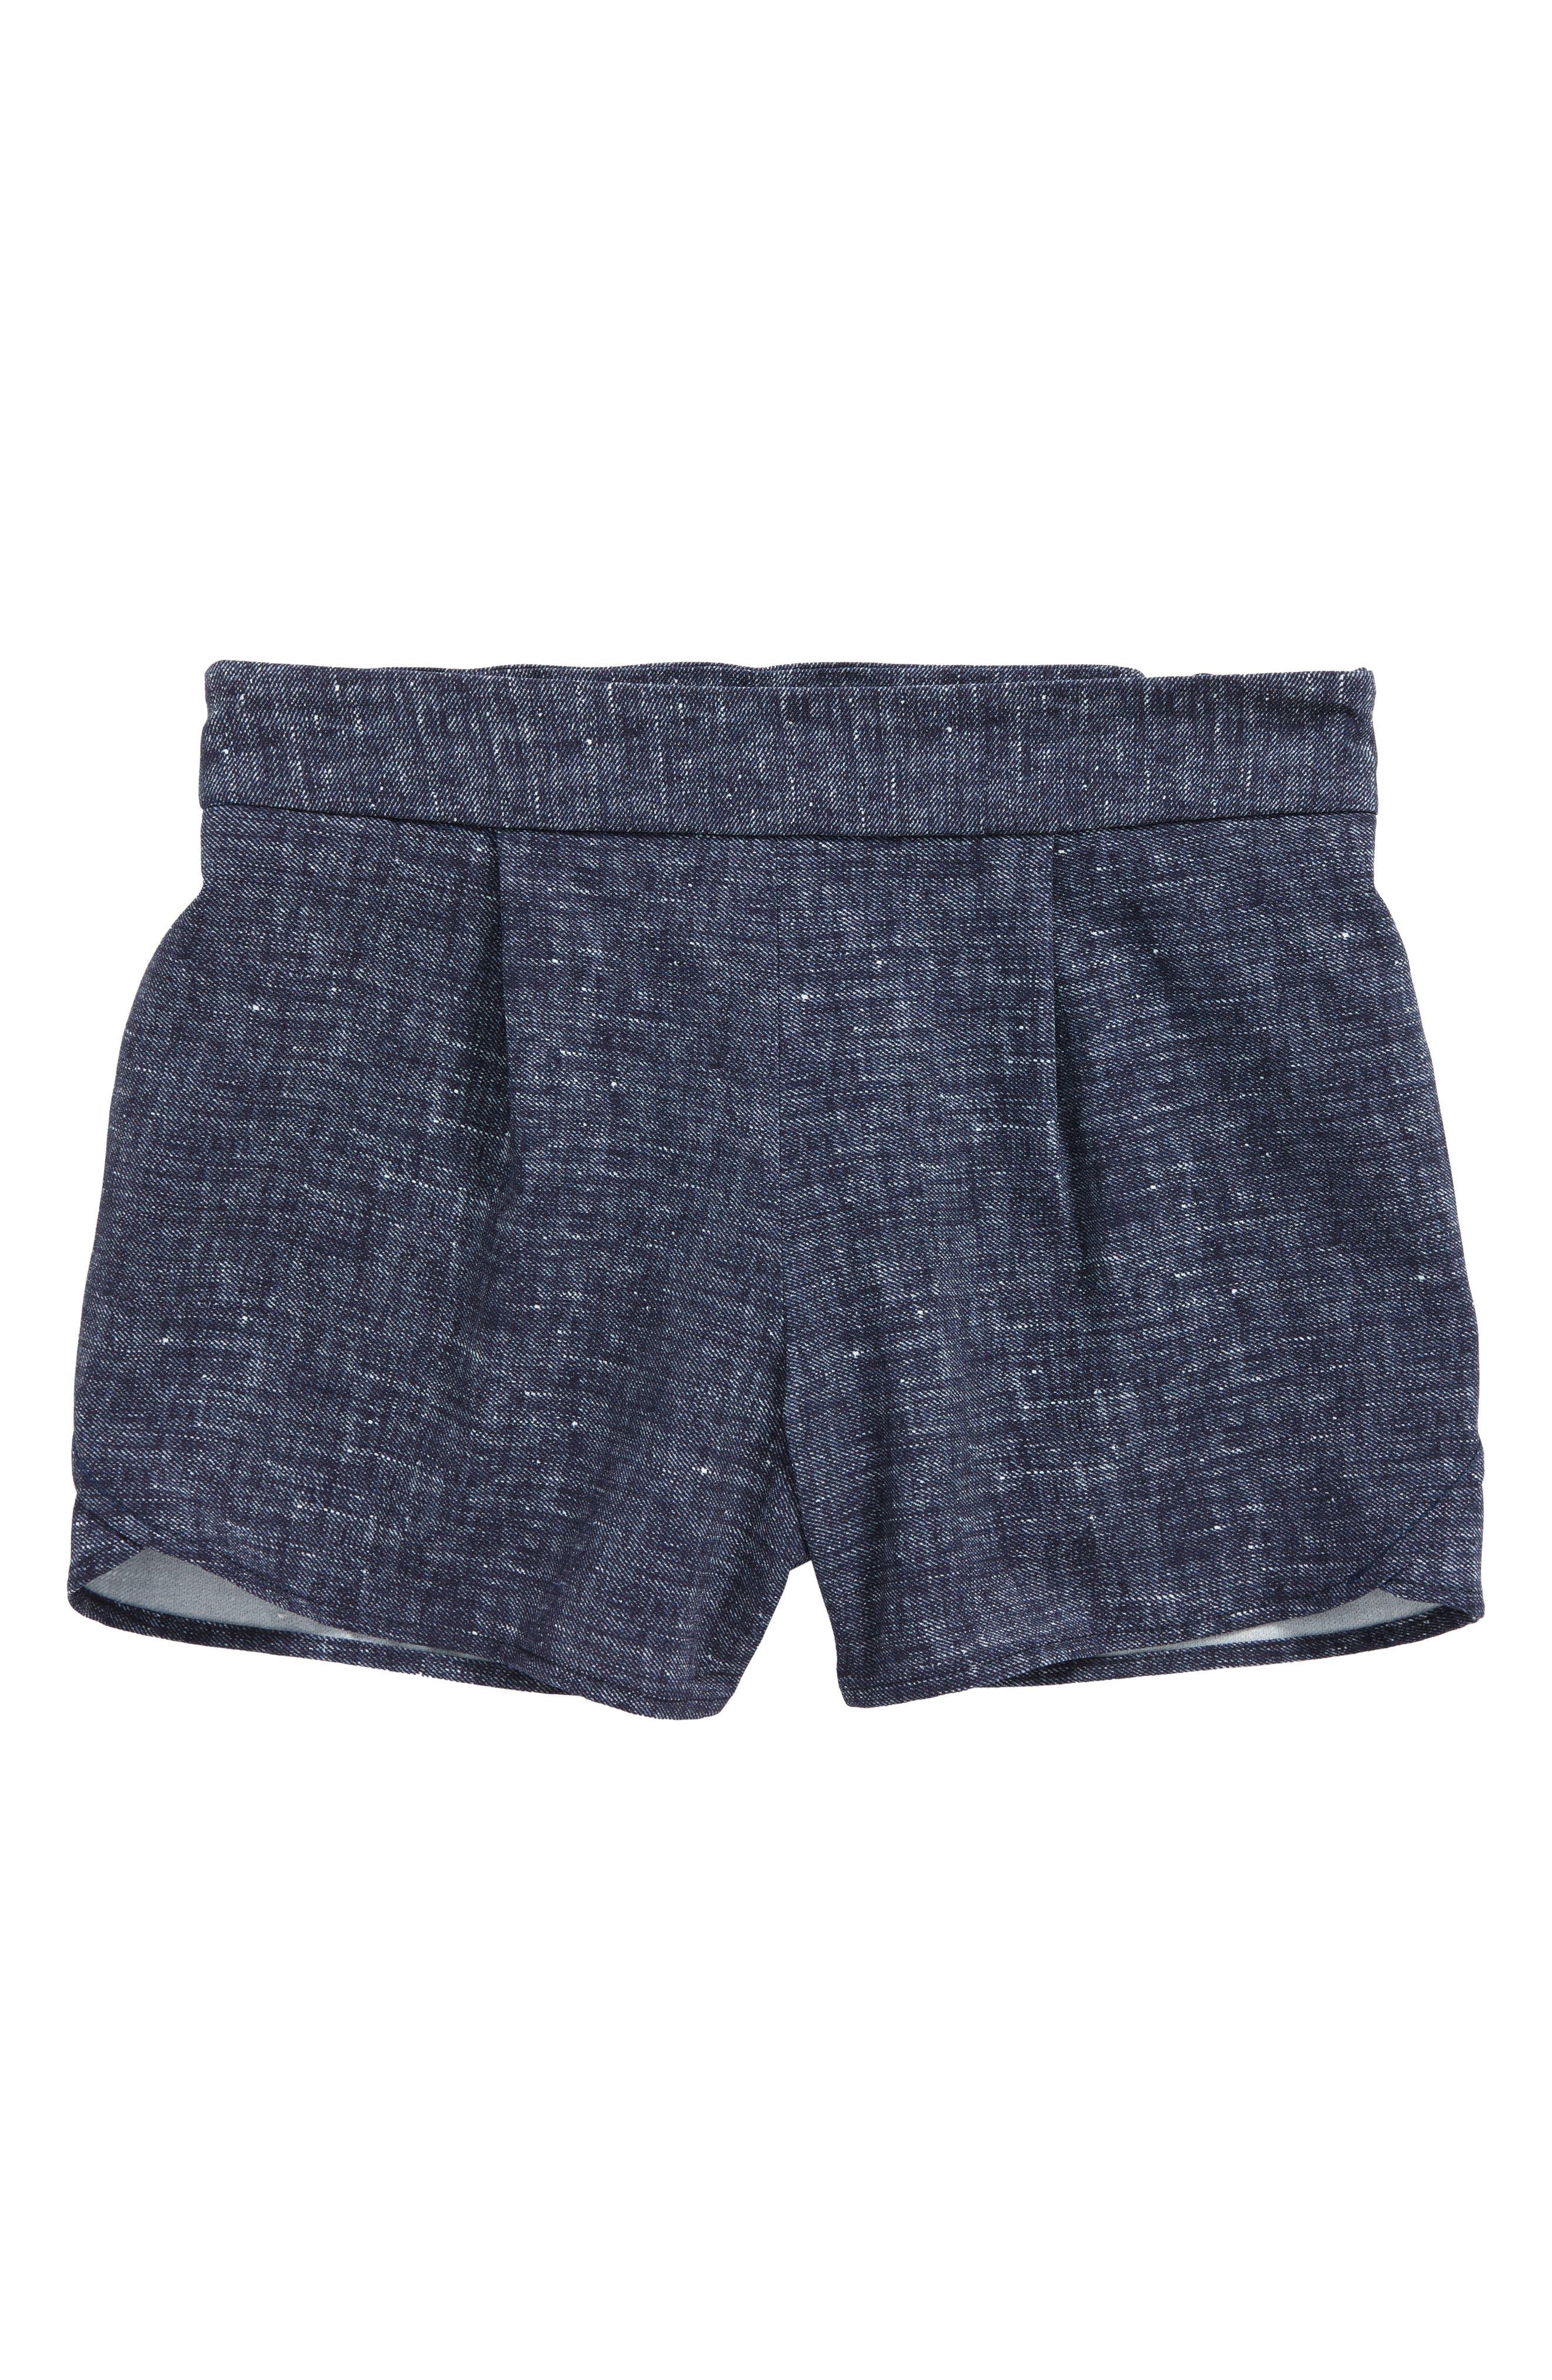 Petal Shorts,                         Main,                         color, 464